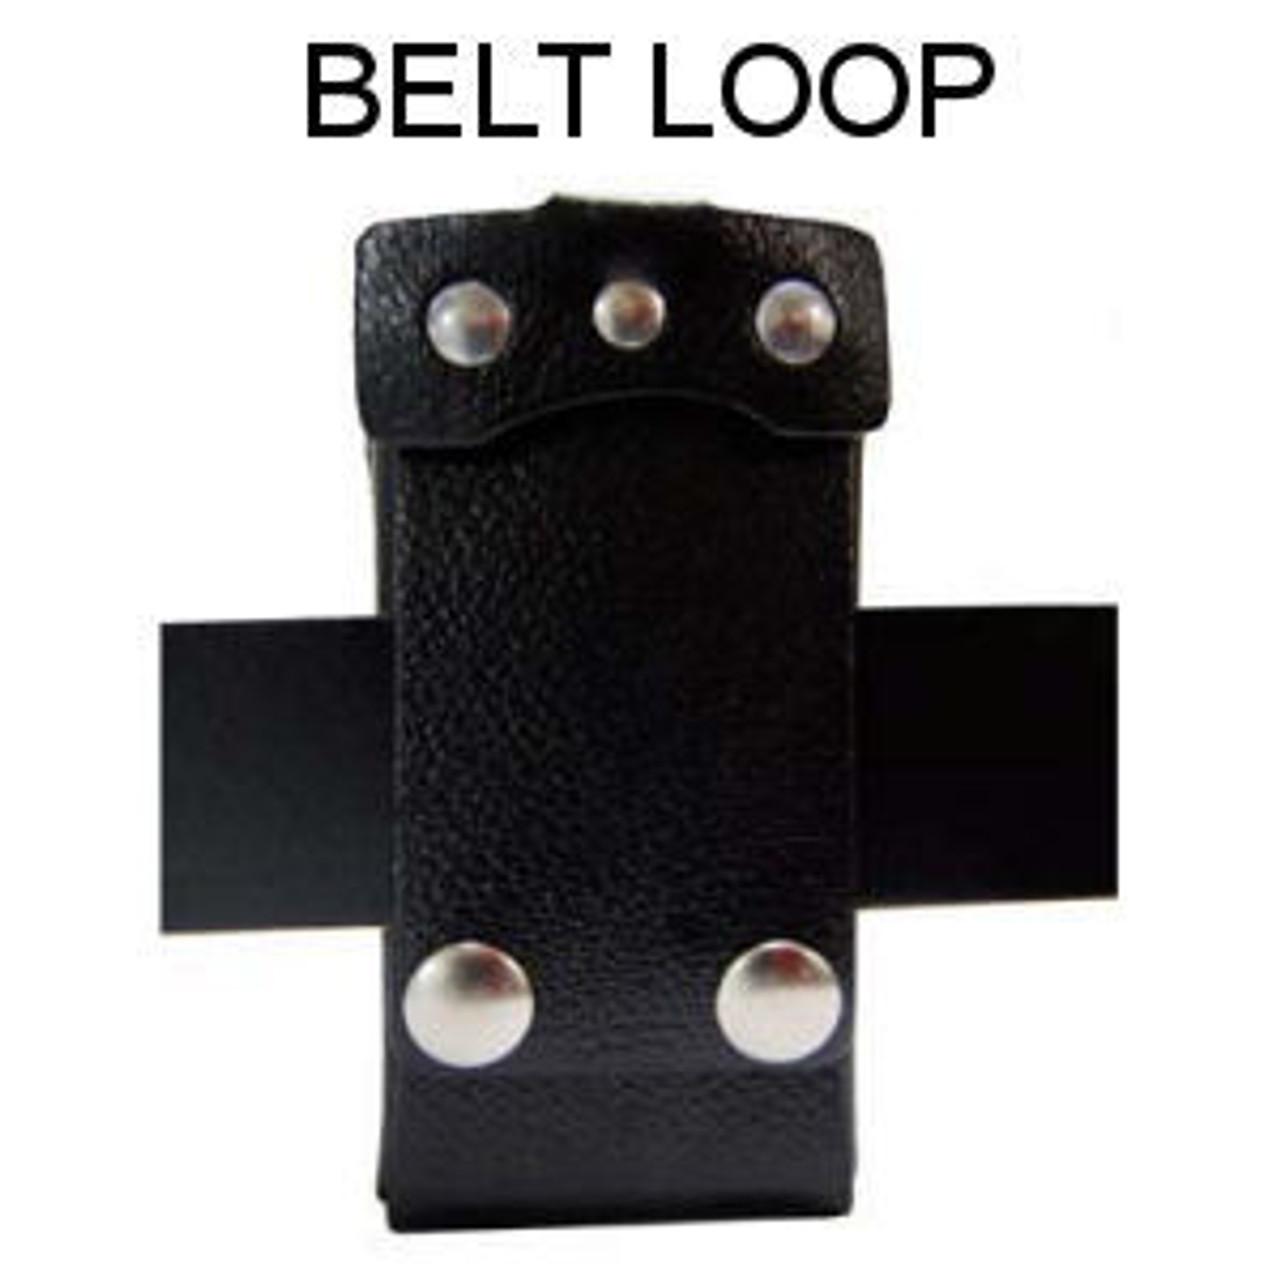 Motorola APX6000 Custom Radio Case With Belt Loop